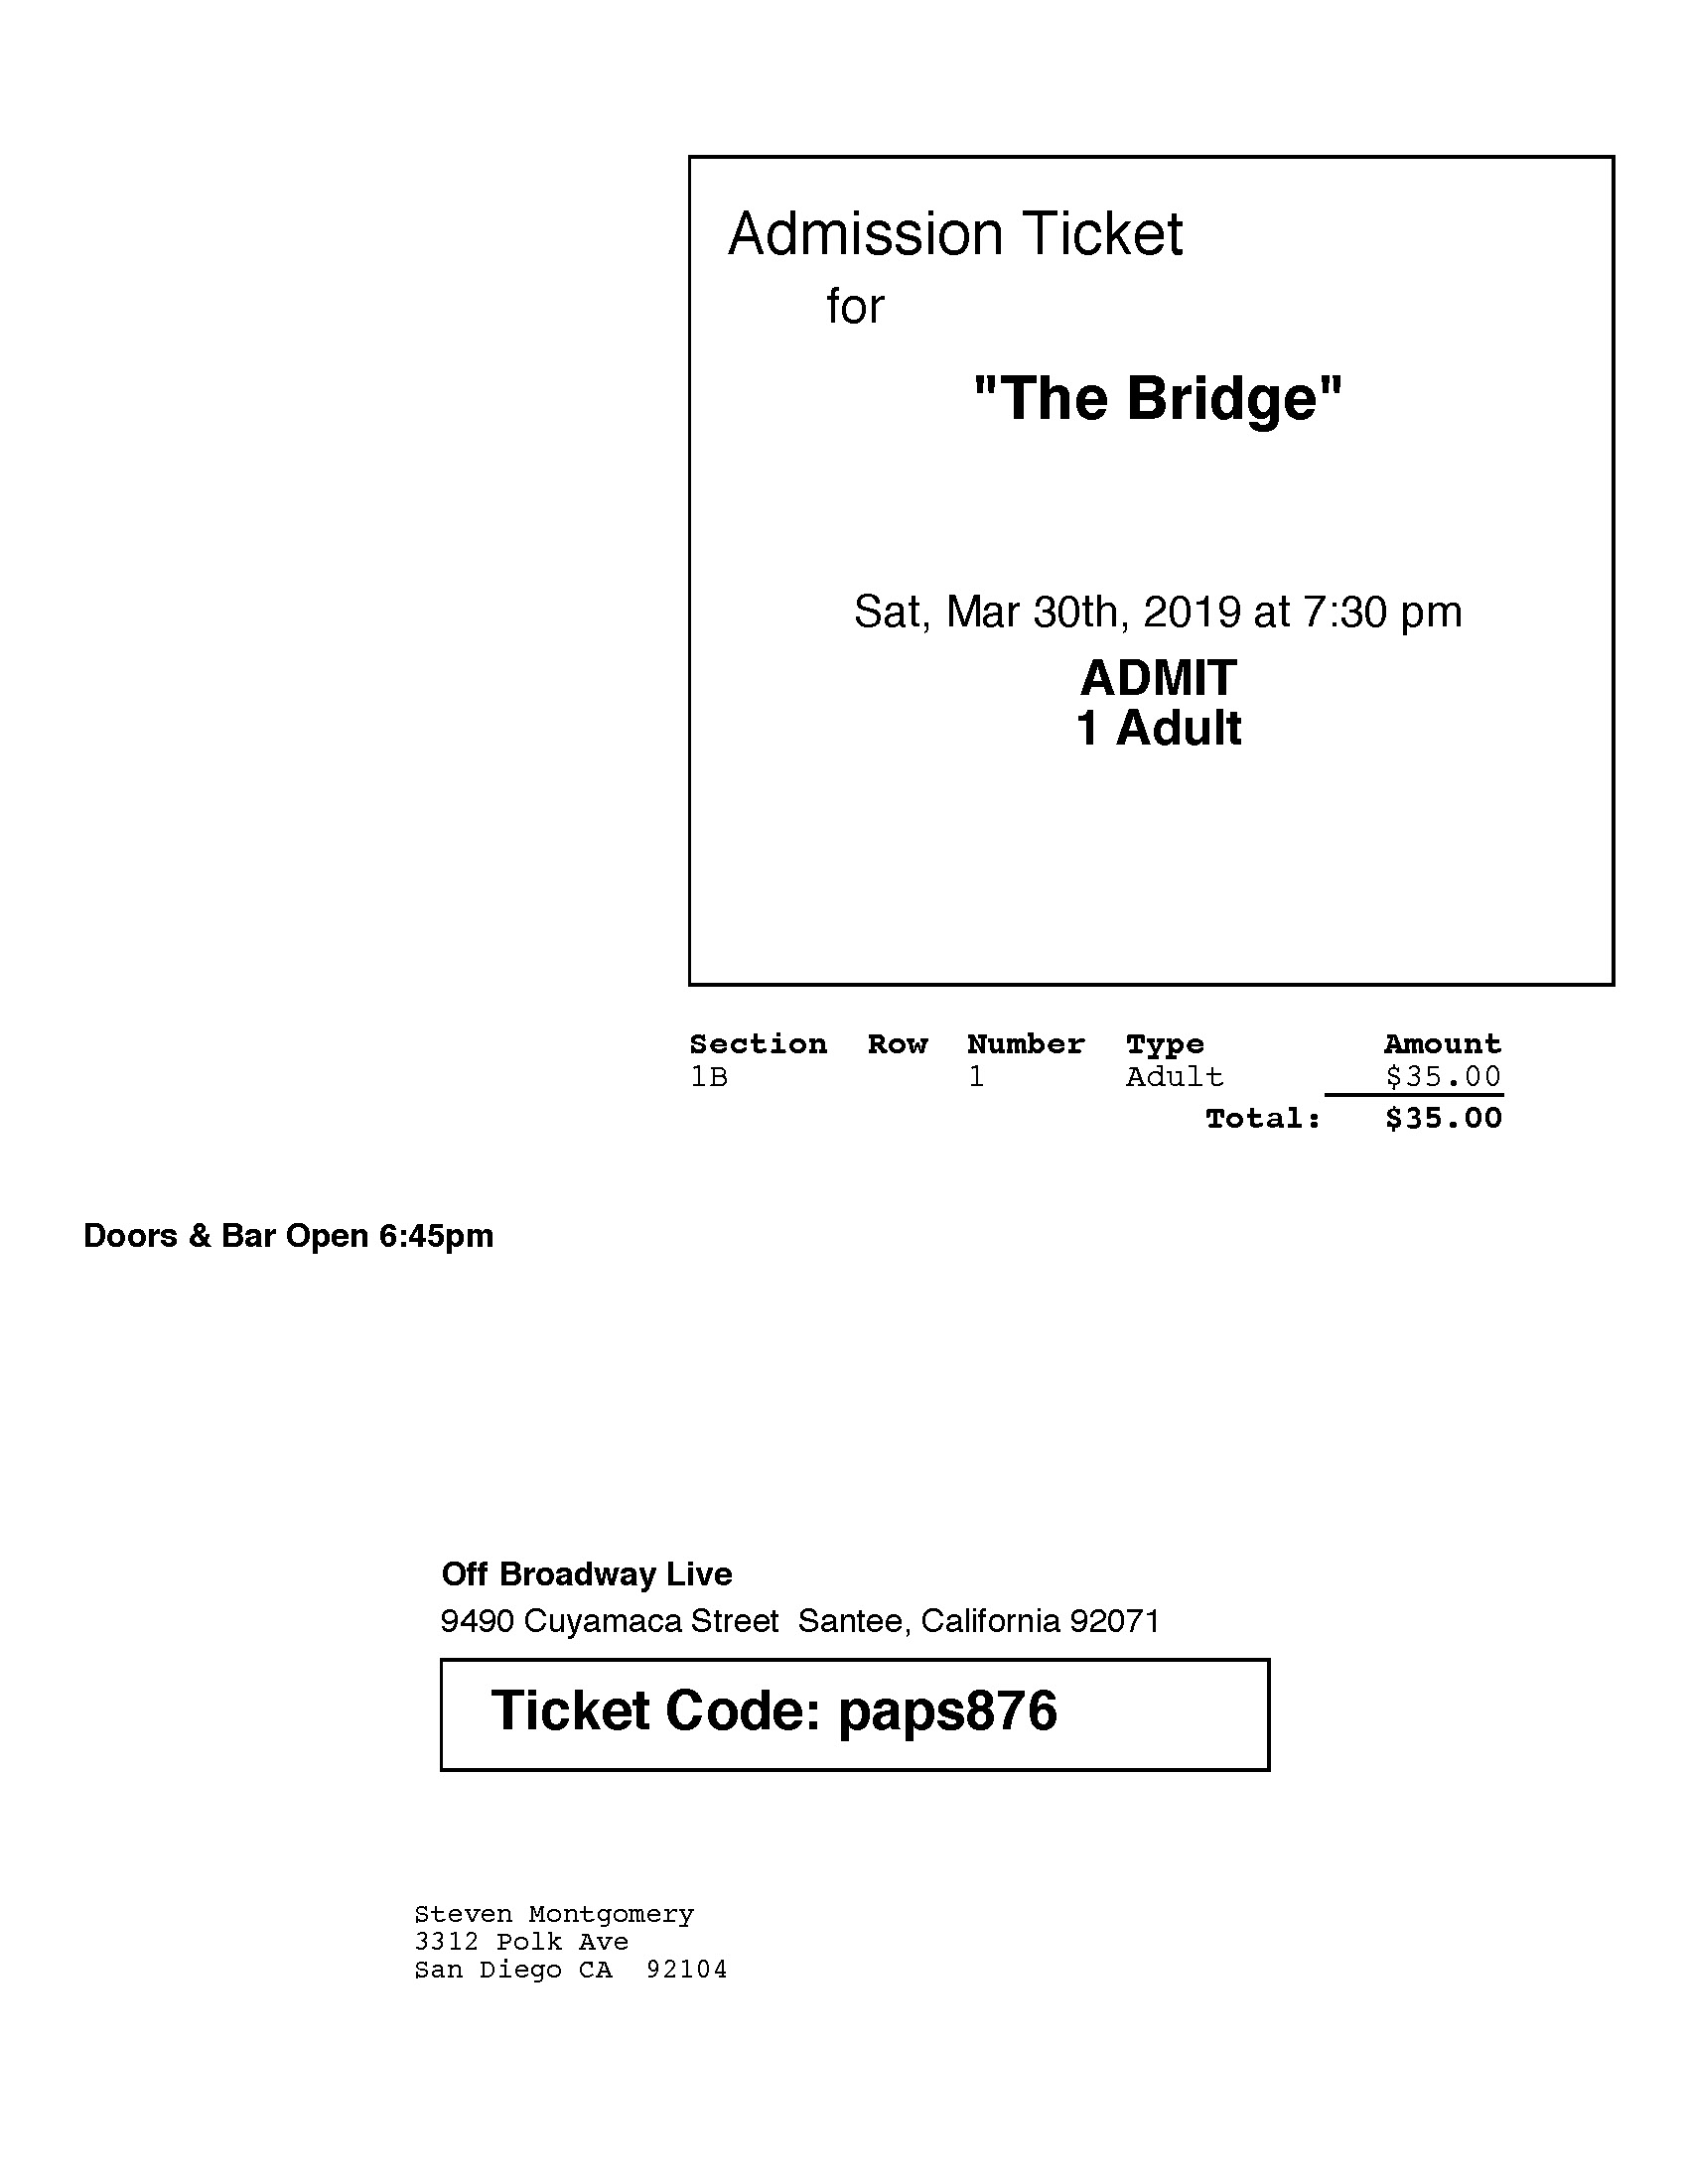 2019-03-30-TheBridge-Ticket.jpg